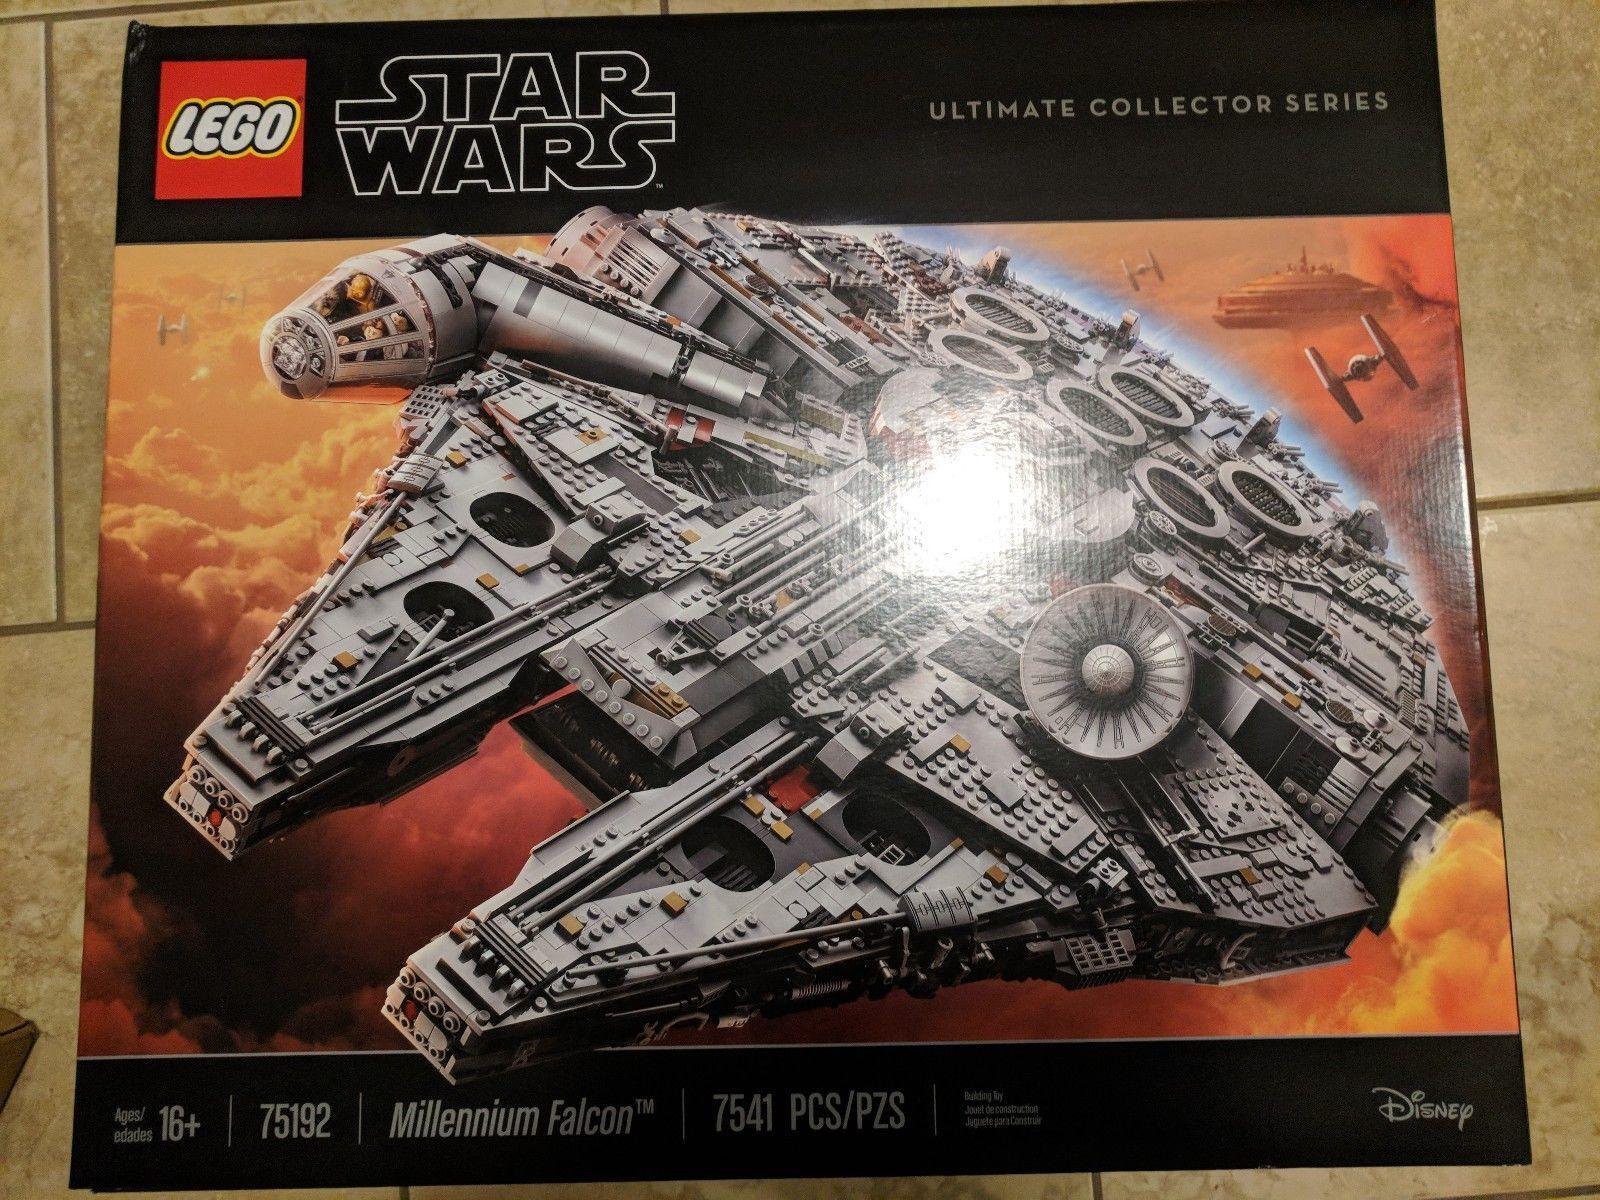 Lego Star Wars Millennium Falcon 2017 UCS Ultimate Collectors Series (75192) NUEVO